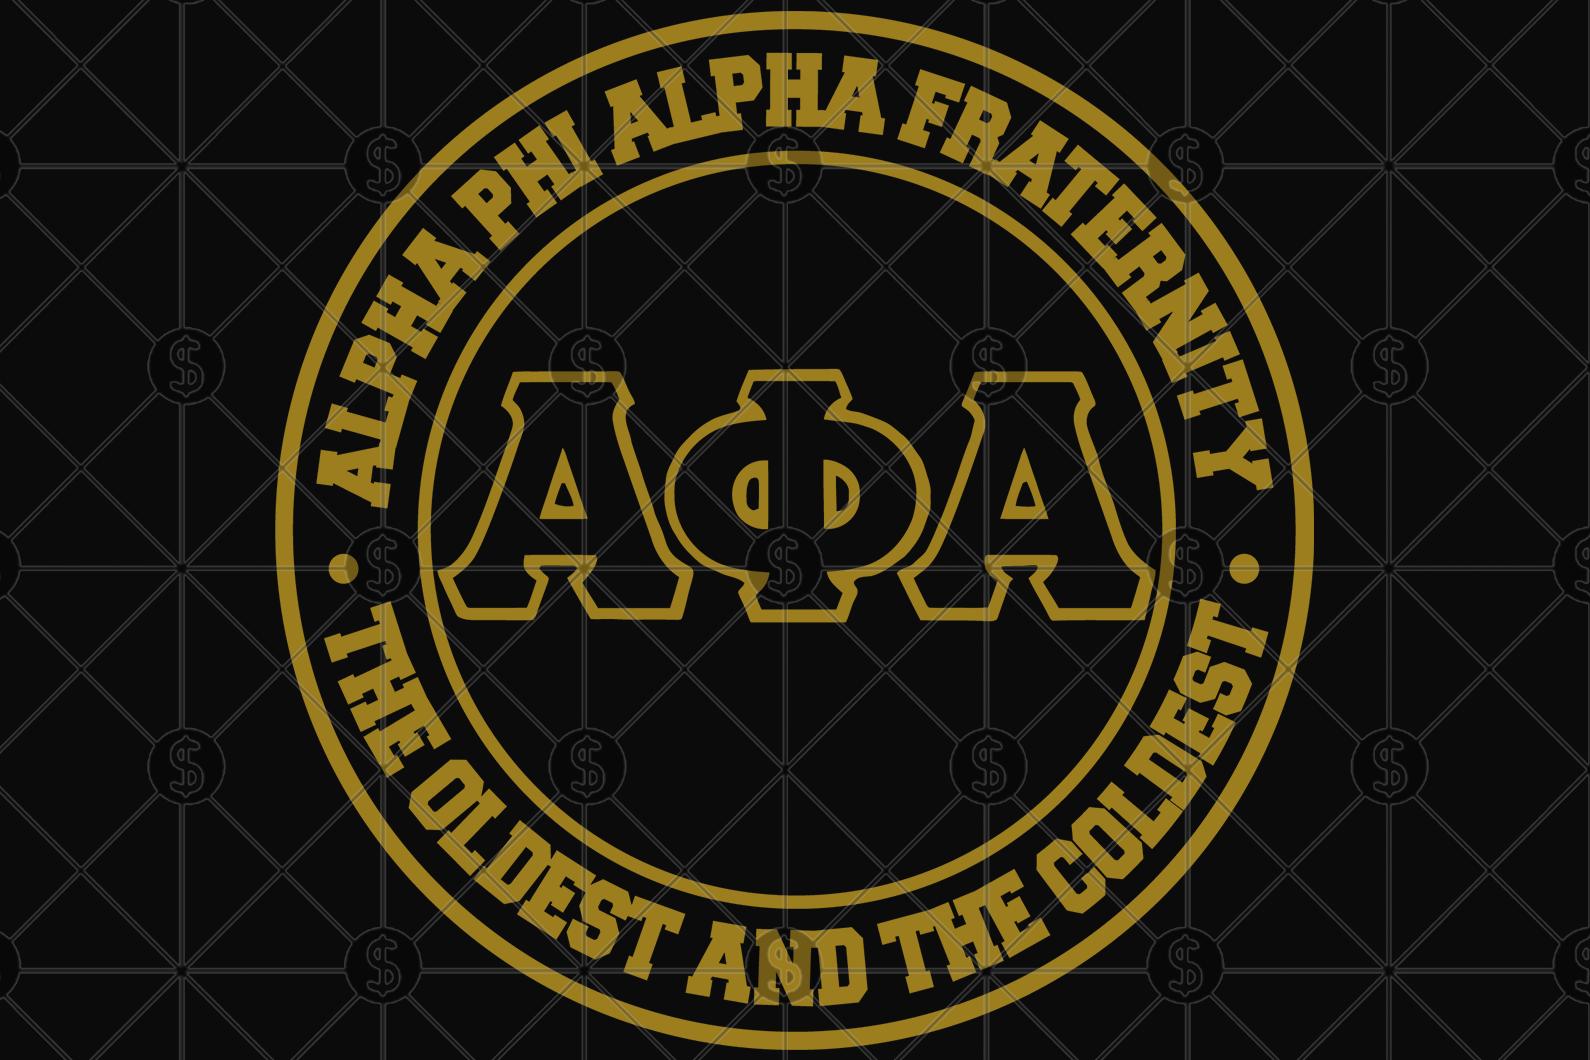 Alpha Phi Alpha Fraternity Svg Alpha Phi Alpha Svg Sorority Svg Aka Sorority Gift Alpha Phi Al Alpha Phi Alpha Fraternity Aka Sorority Gifts Alpha Phi Alpha